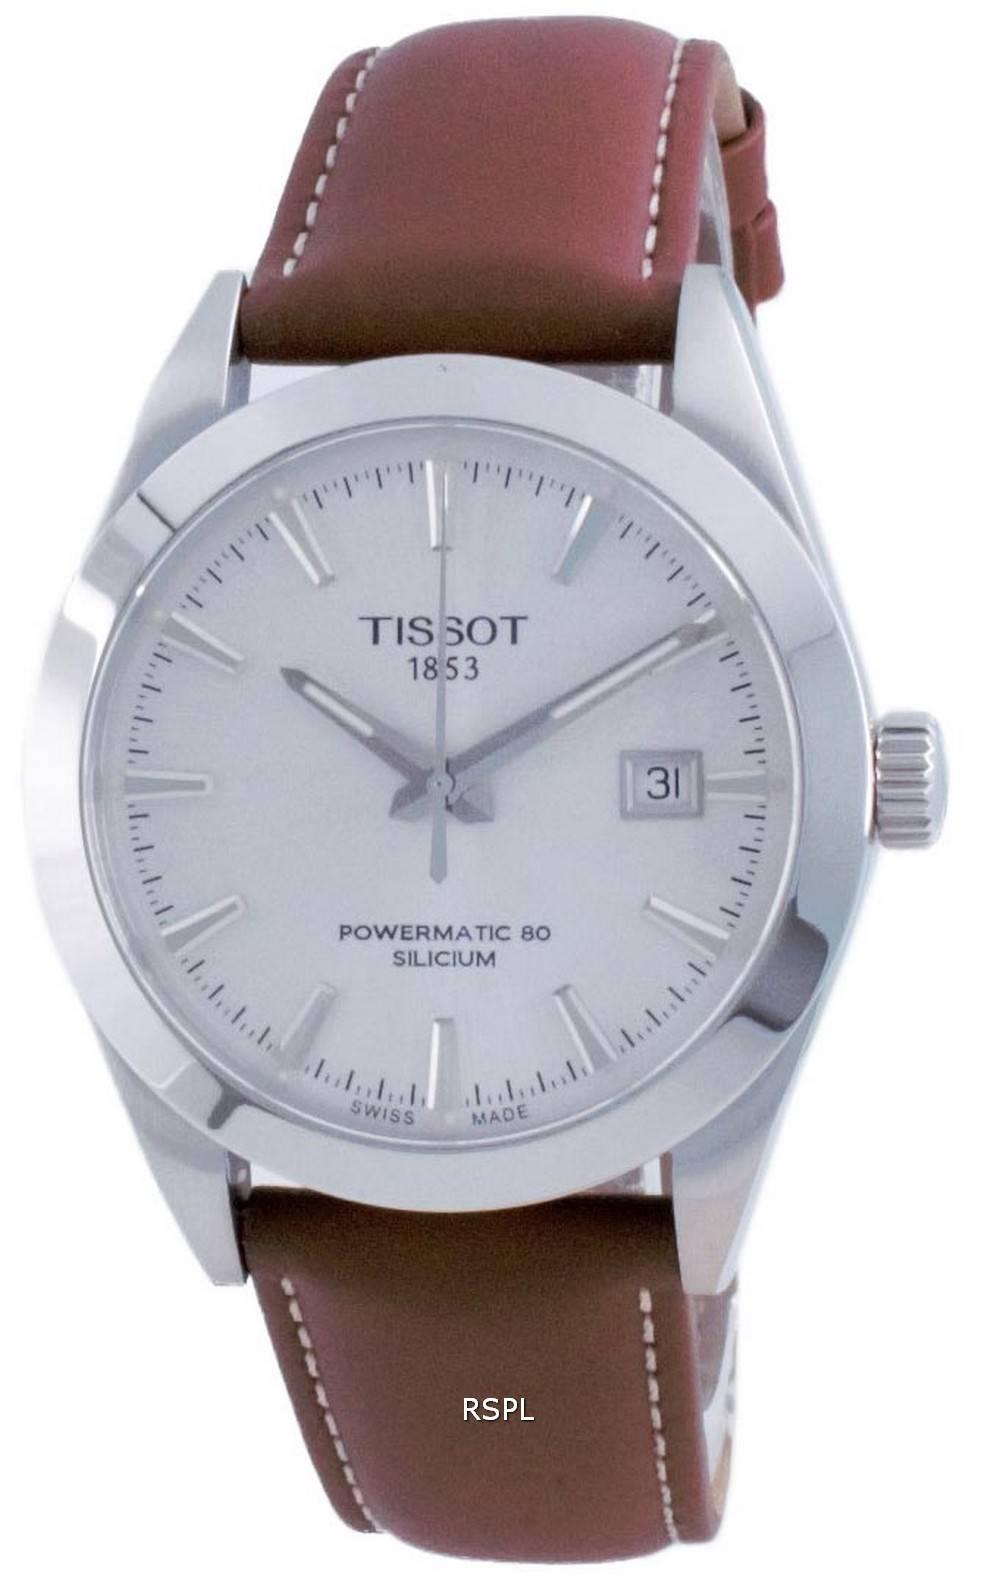 Tissot T-Classic Gentleman Powermatic 80 Silicium Automatic T127.407.16.031.00 T1274071603100 100M miesten kello